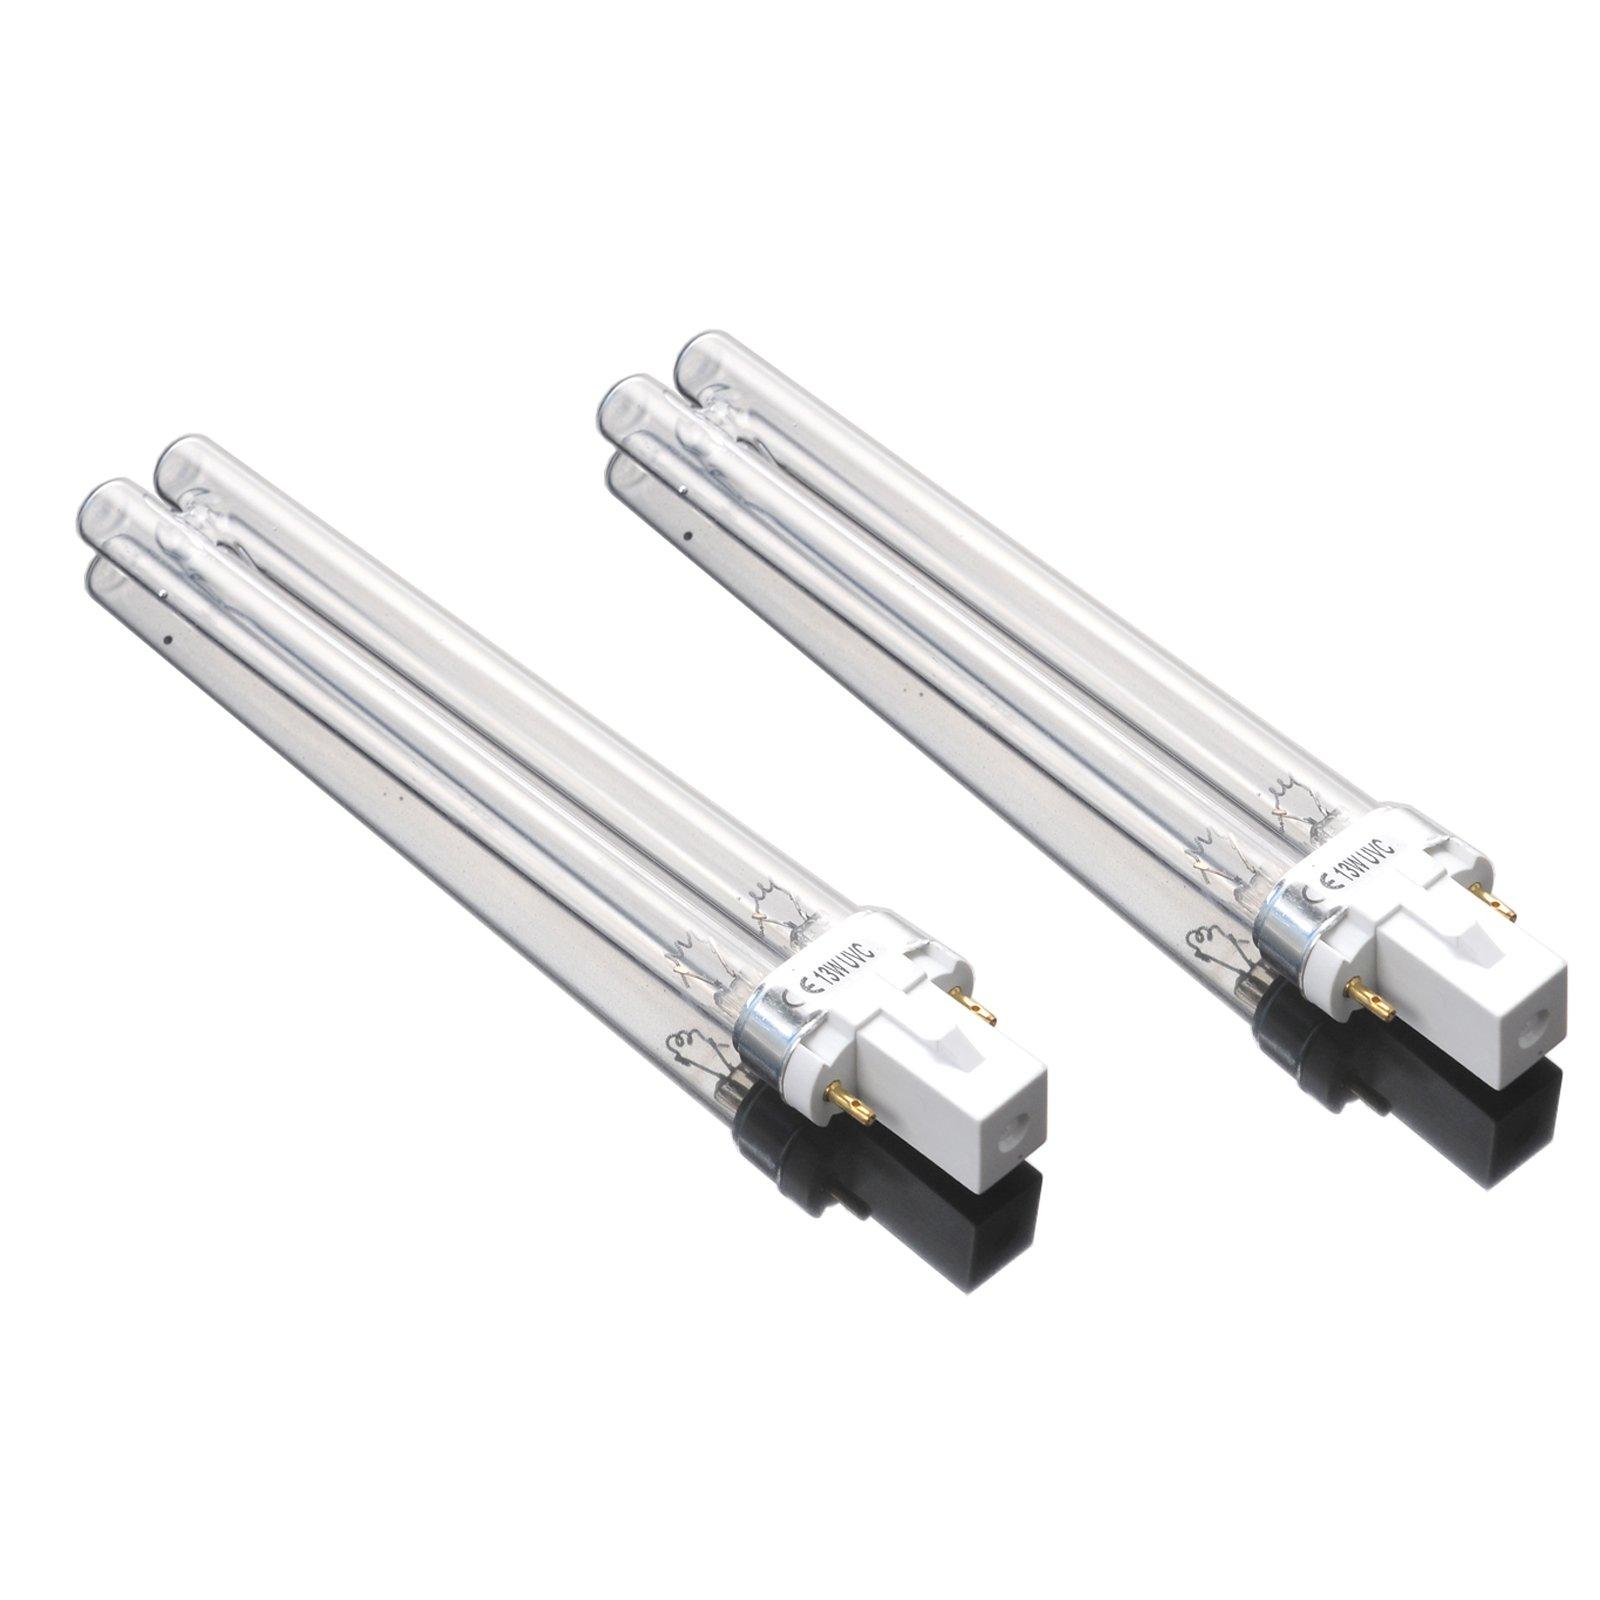 AQUANEAT 13 Watt Replacement UV Bulb G23 2 Pin Base for SUNSUN Pond Filter UV Sterilizer JUP-23